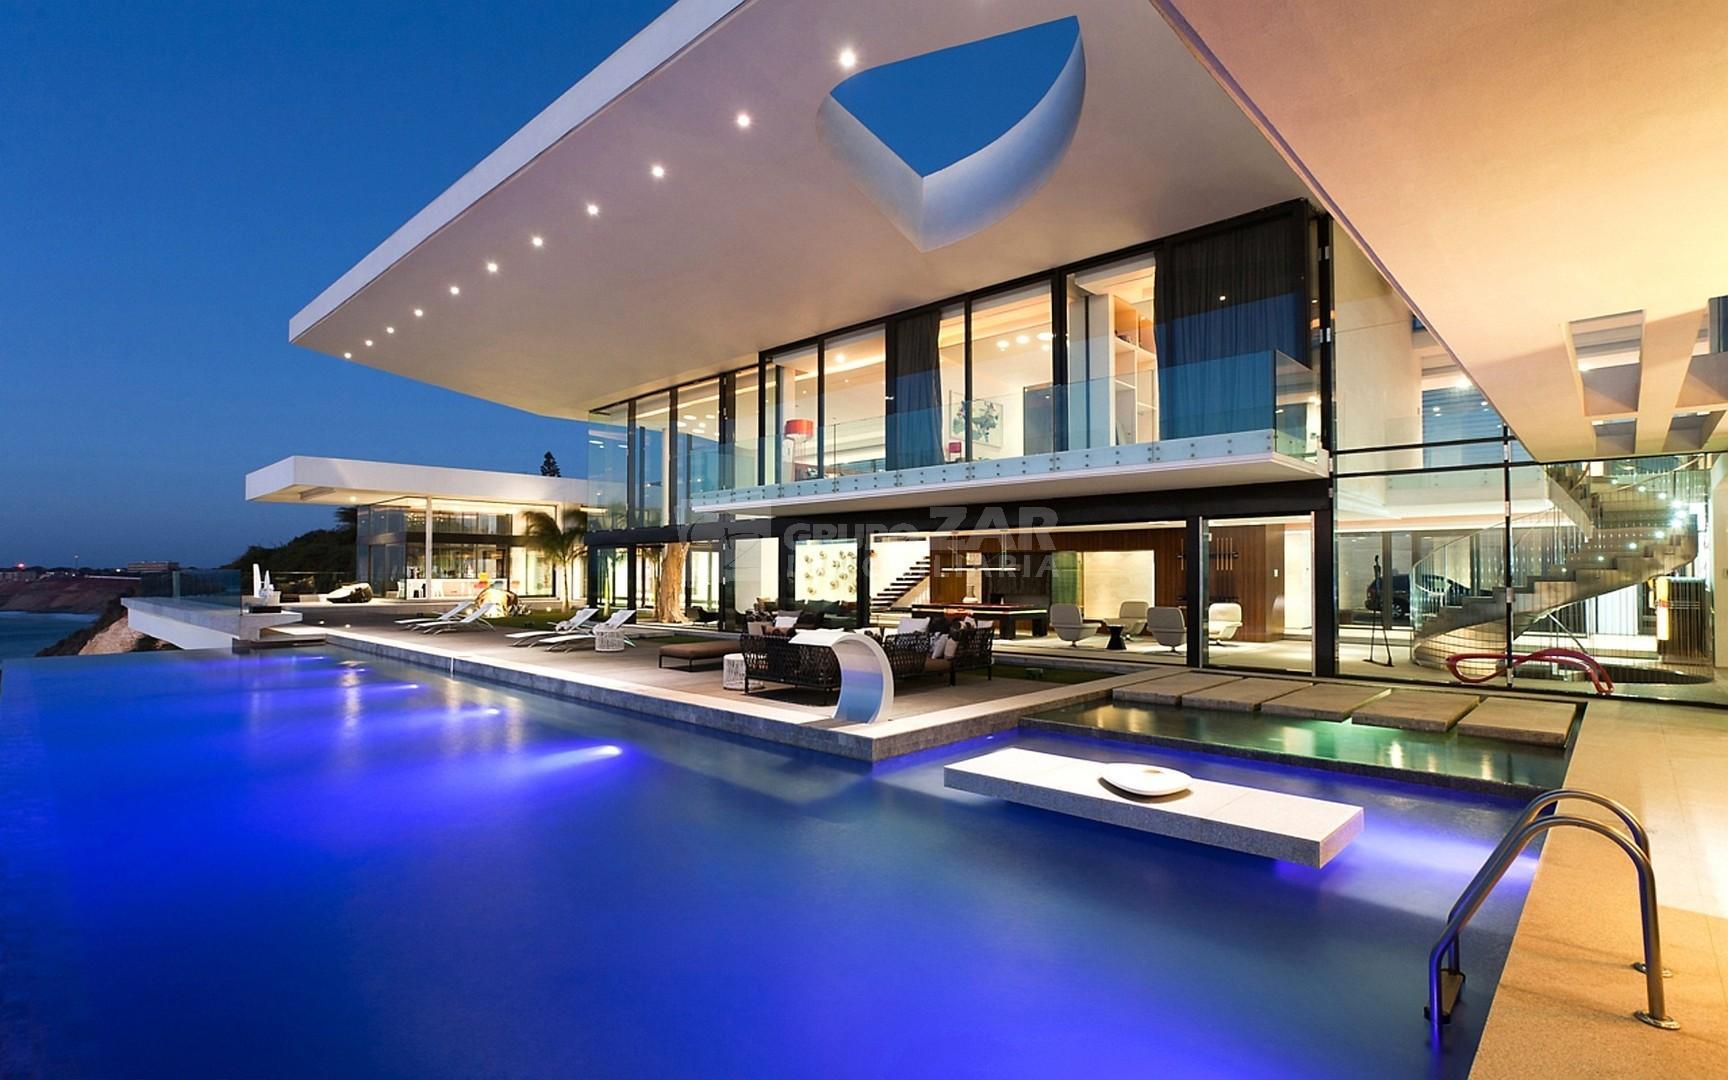 inmobiliaria grupo vivienda: